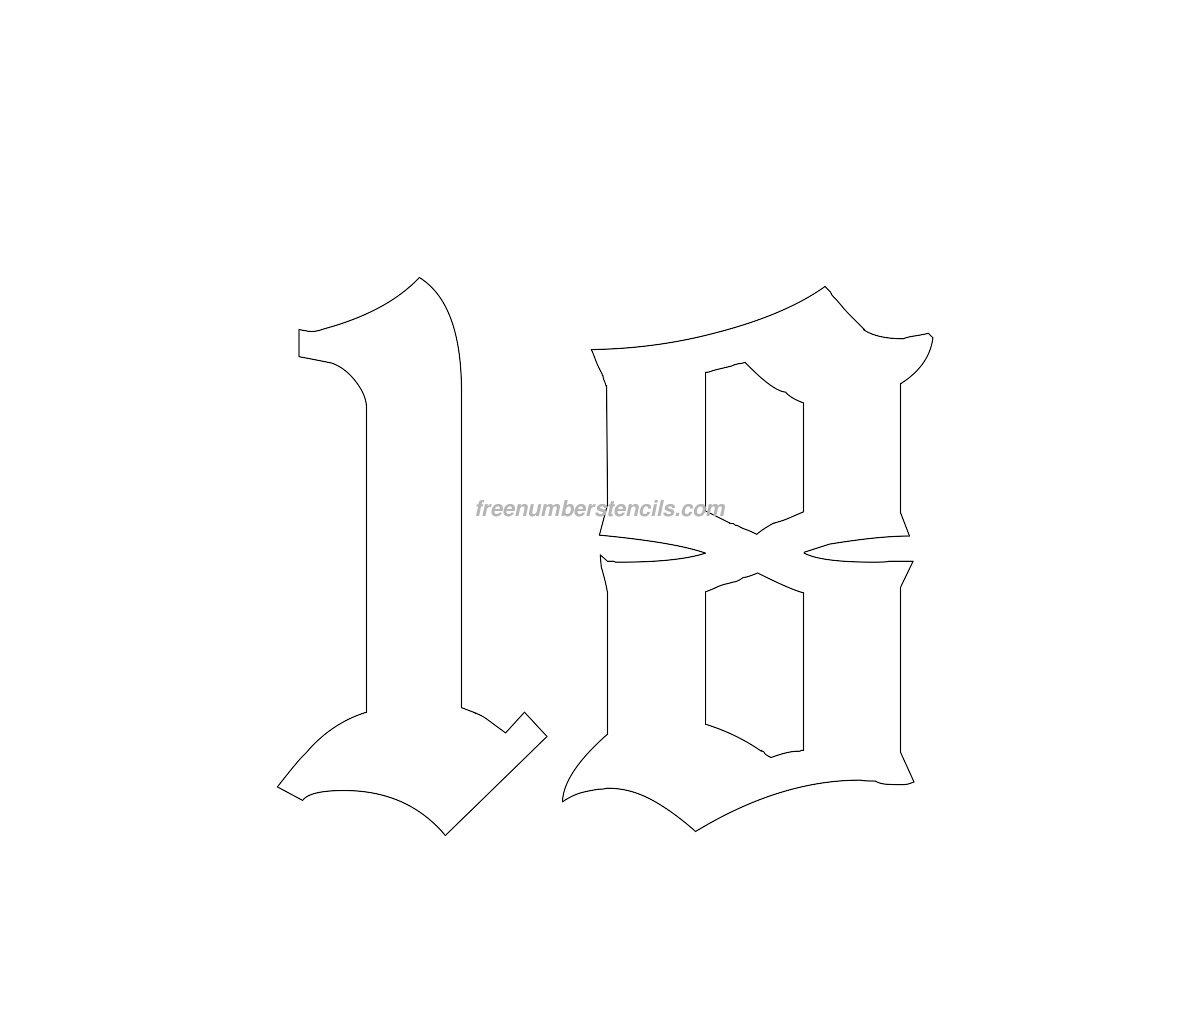 freenumberstencils.com/old-school/number-18.jpg